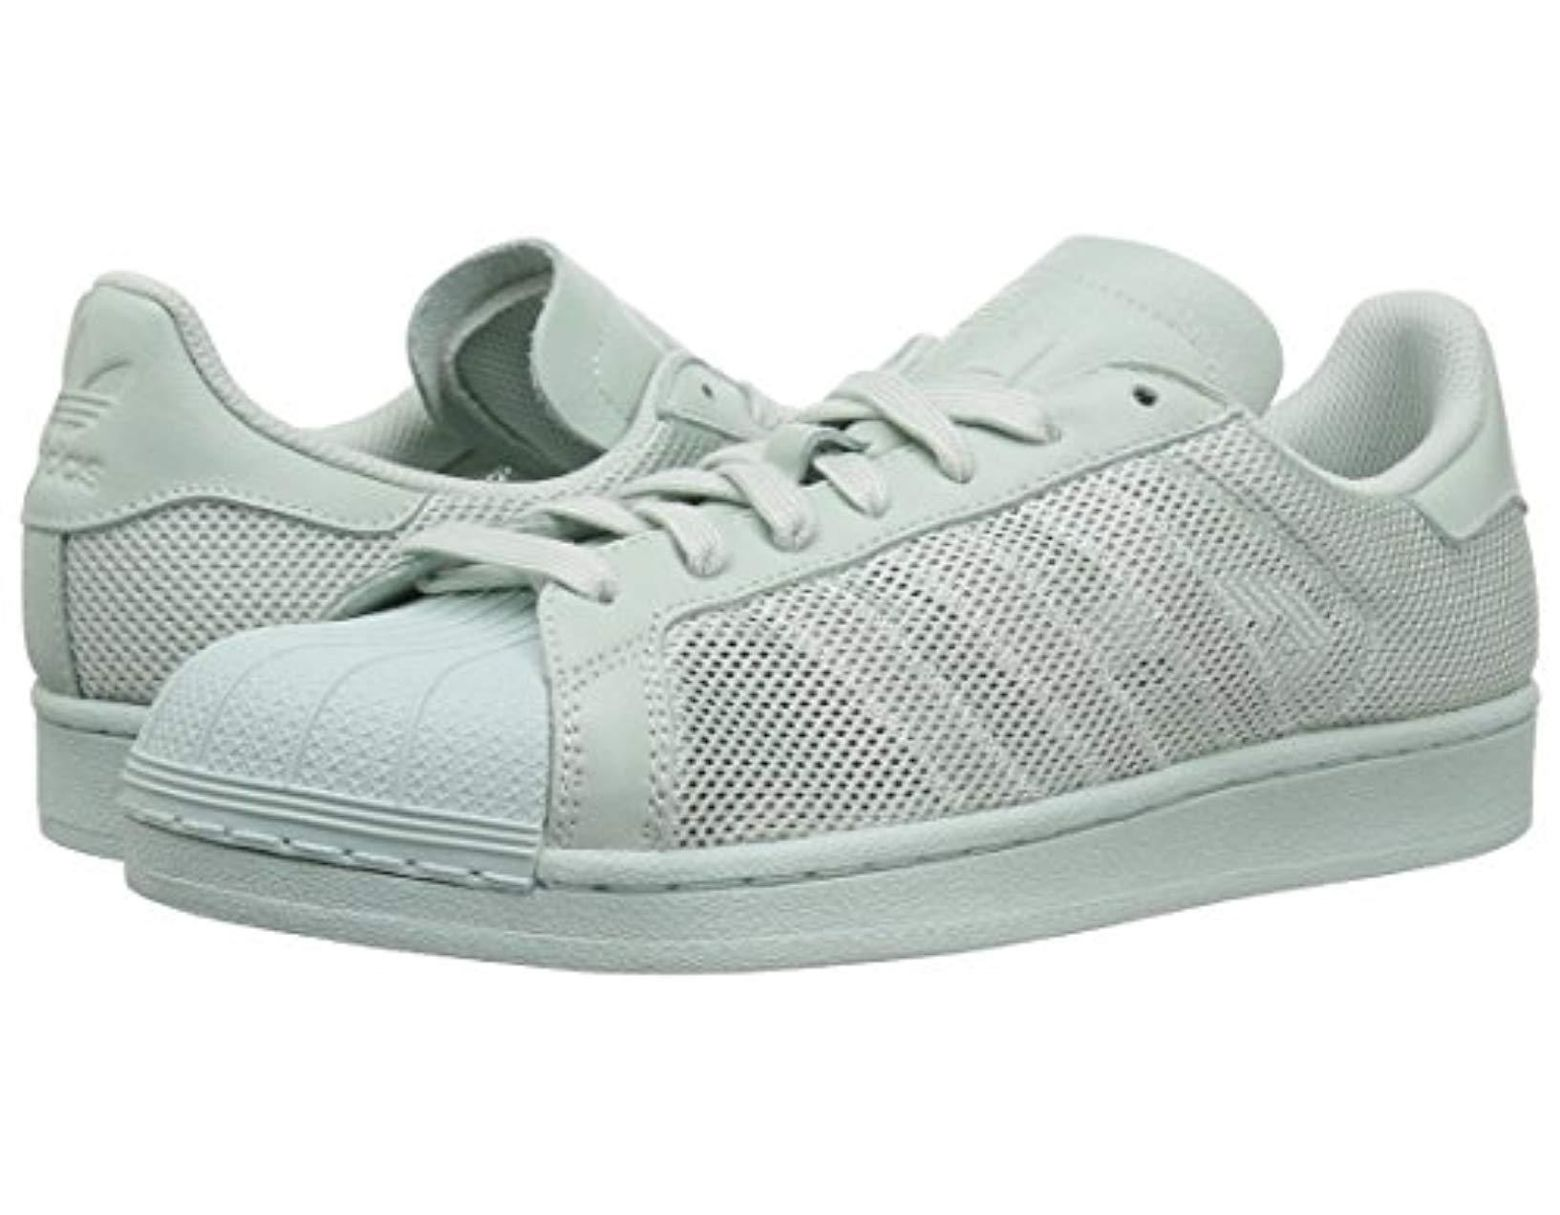 7ee480697c0 Lyst - adidas Originals Superstar Triple for Men